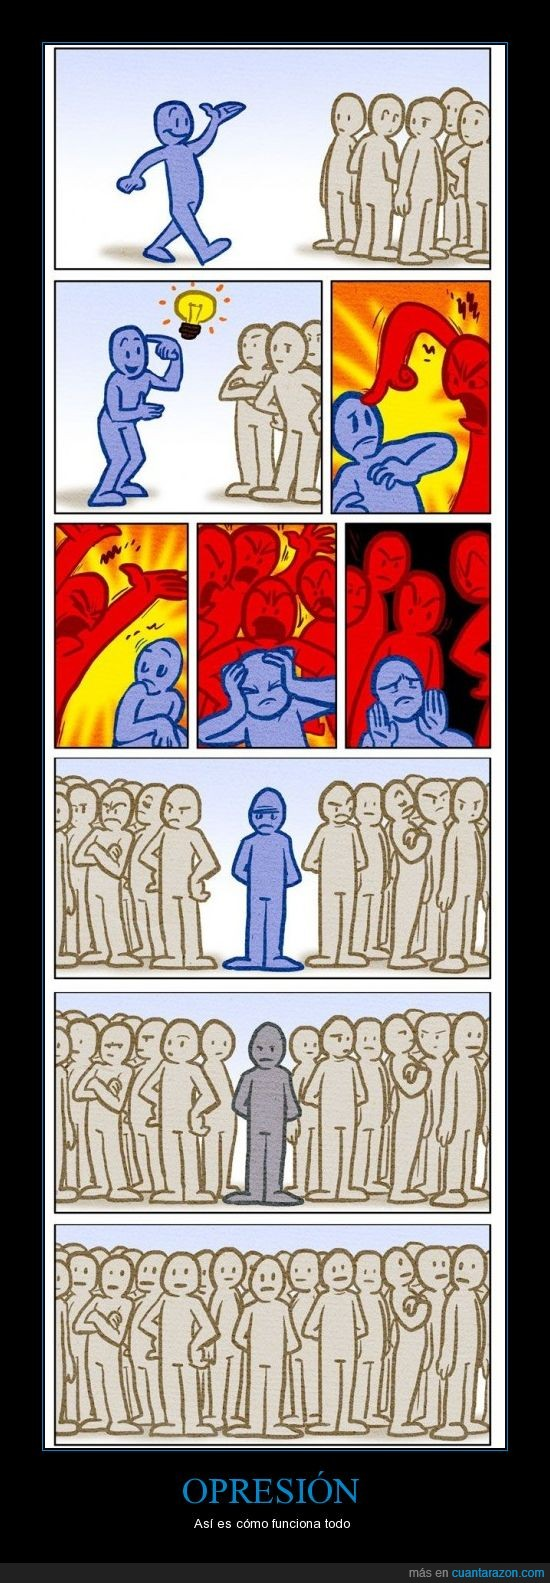 controlar,gente,idea,iguales,multitud